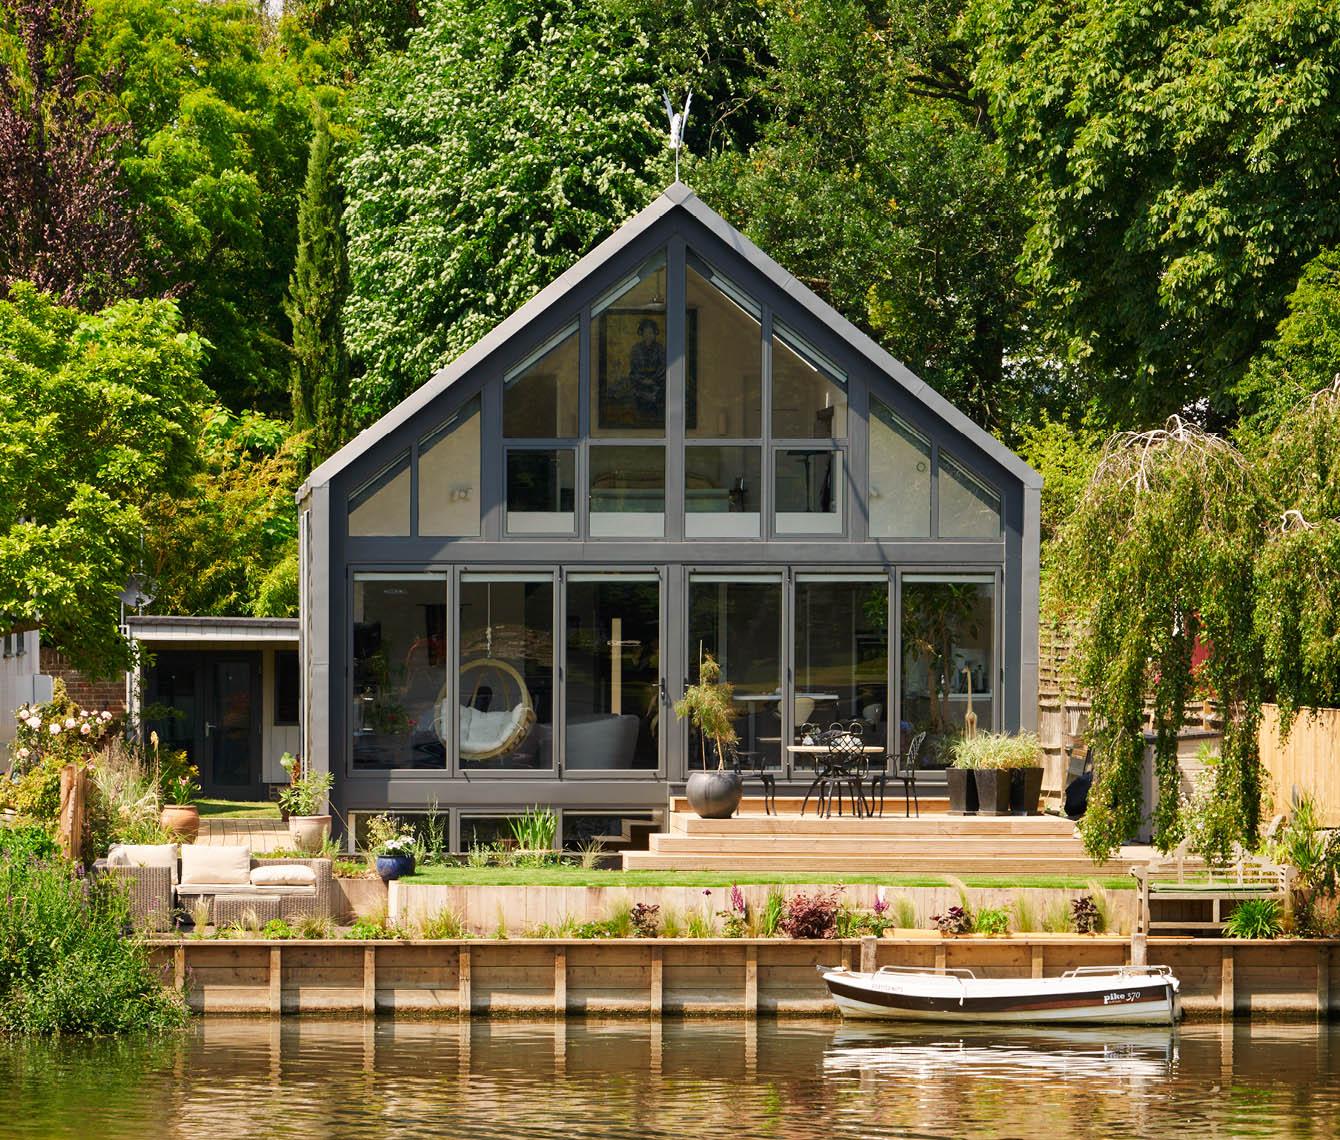 An Amphibious House That Floats During Floods  Custom